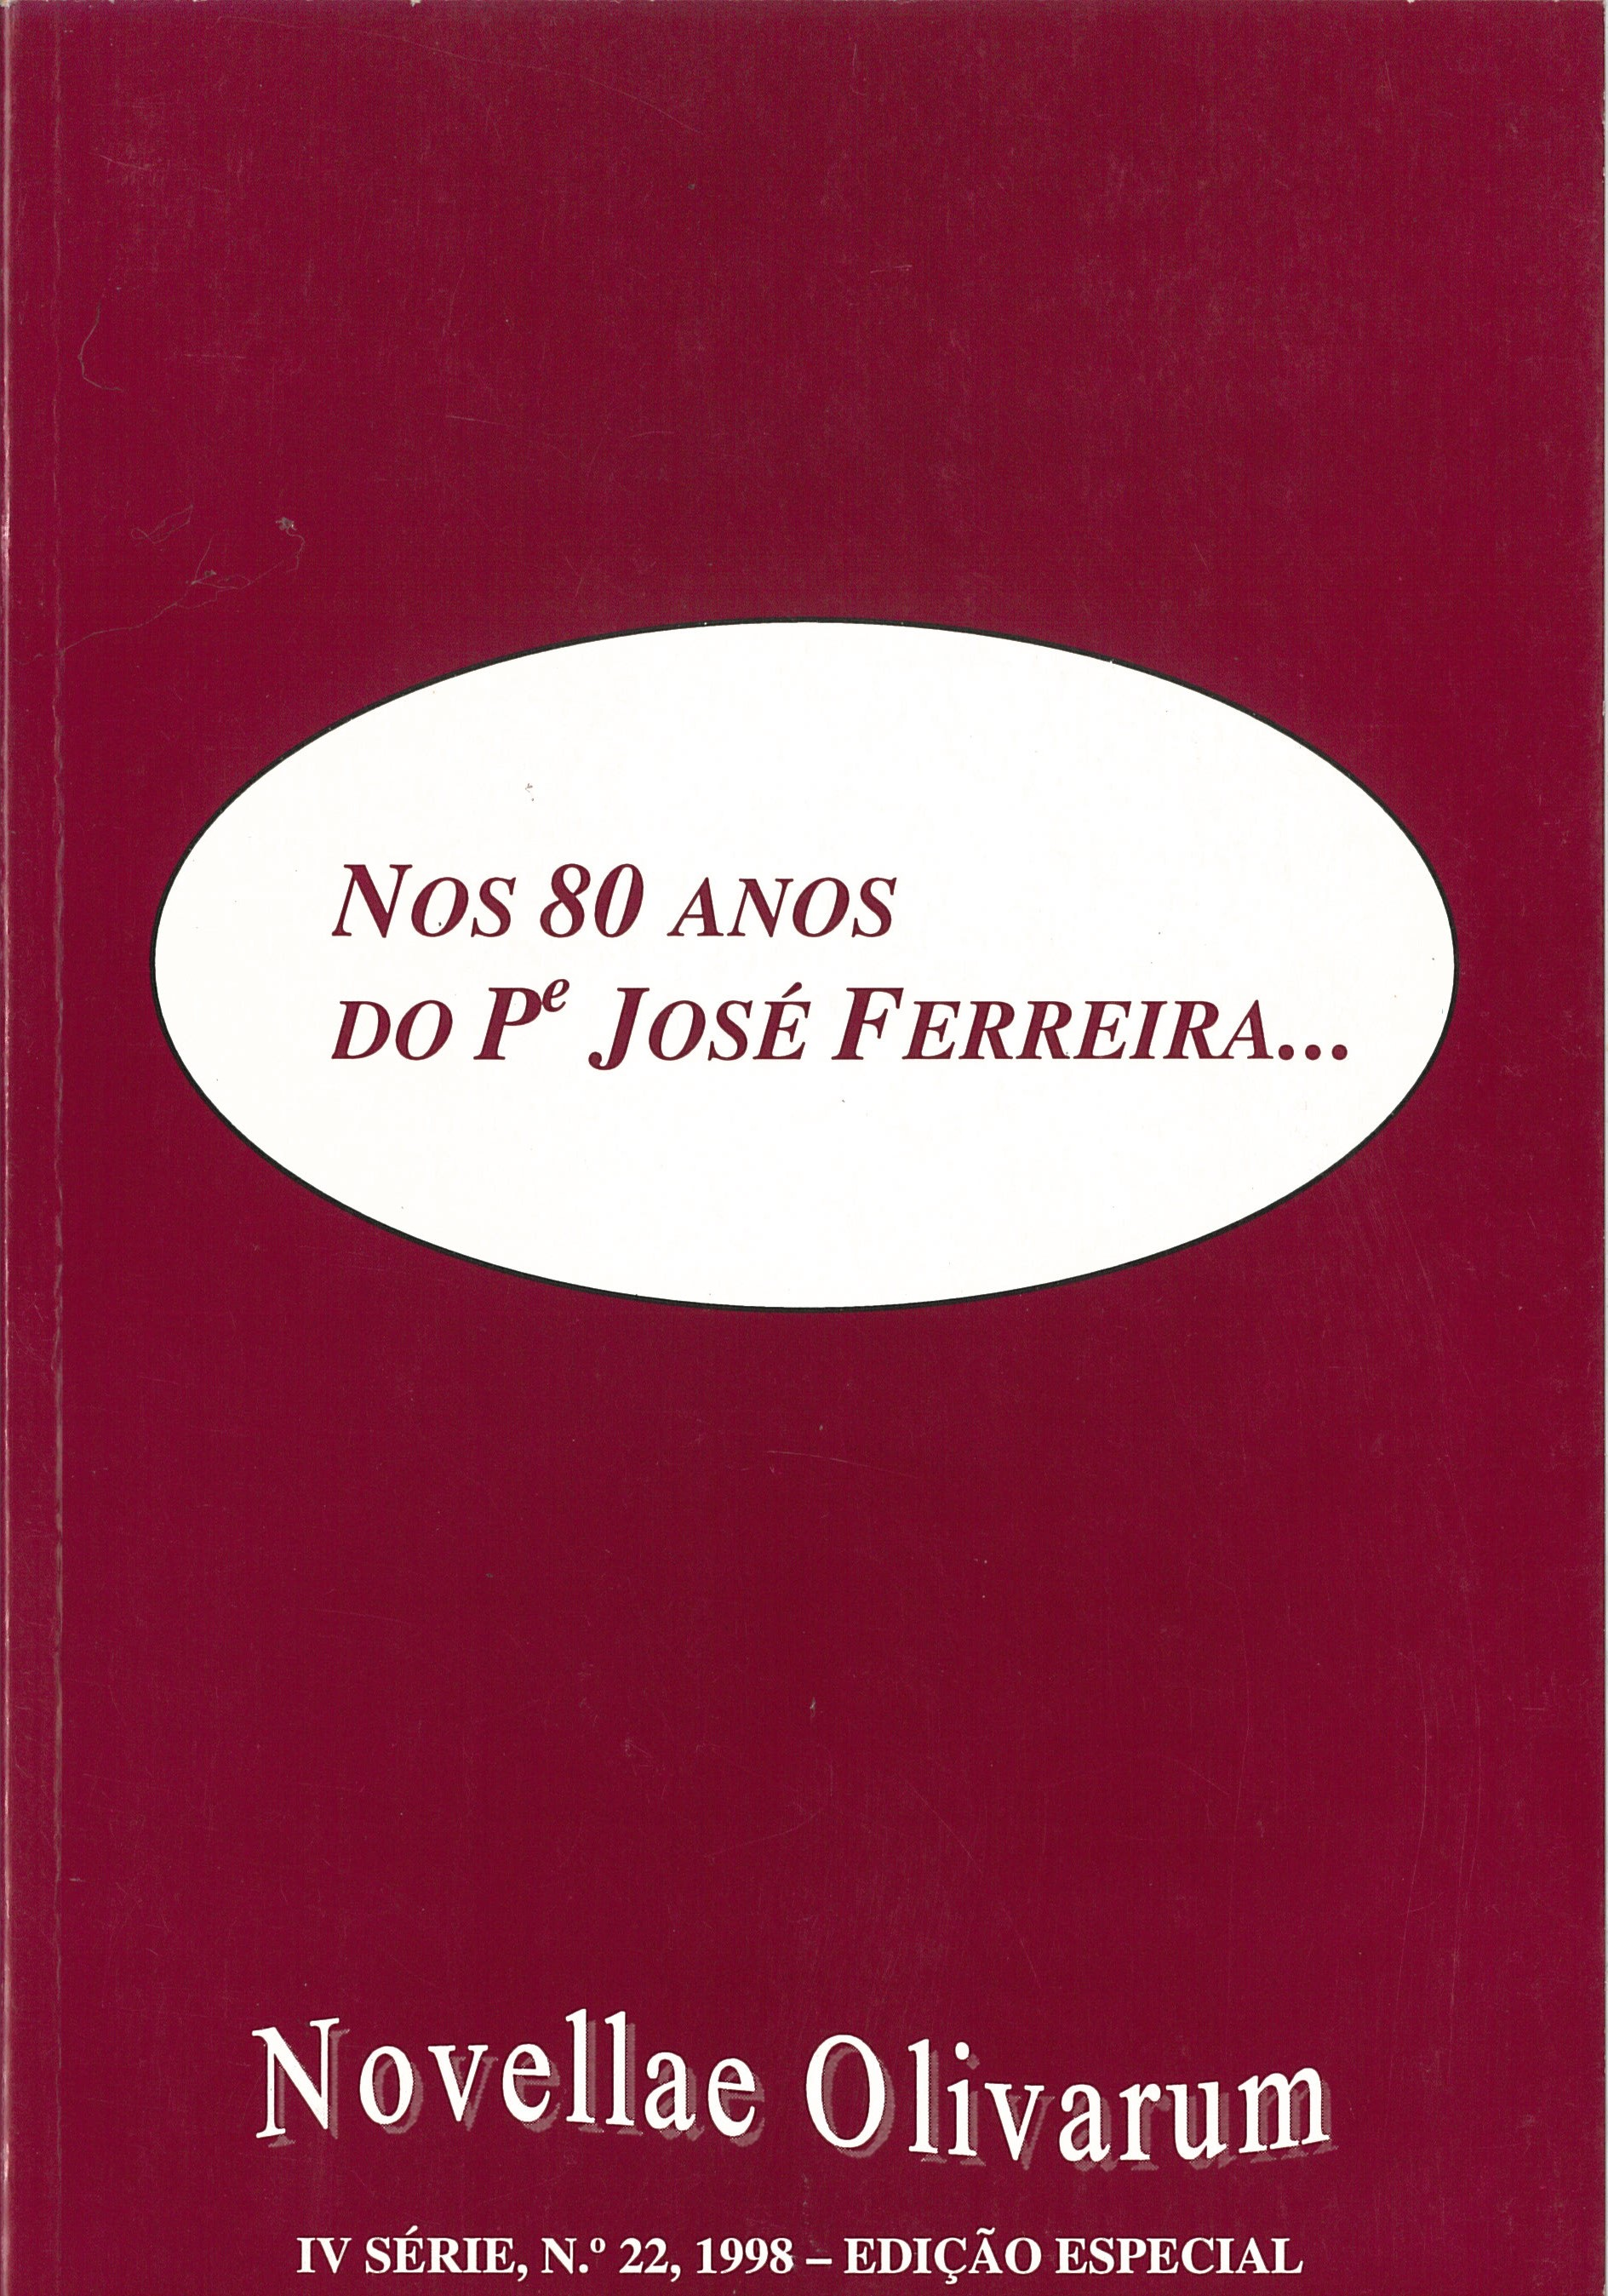 Revista Novellae Olivarum, nº 22 - 1998 (capa)